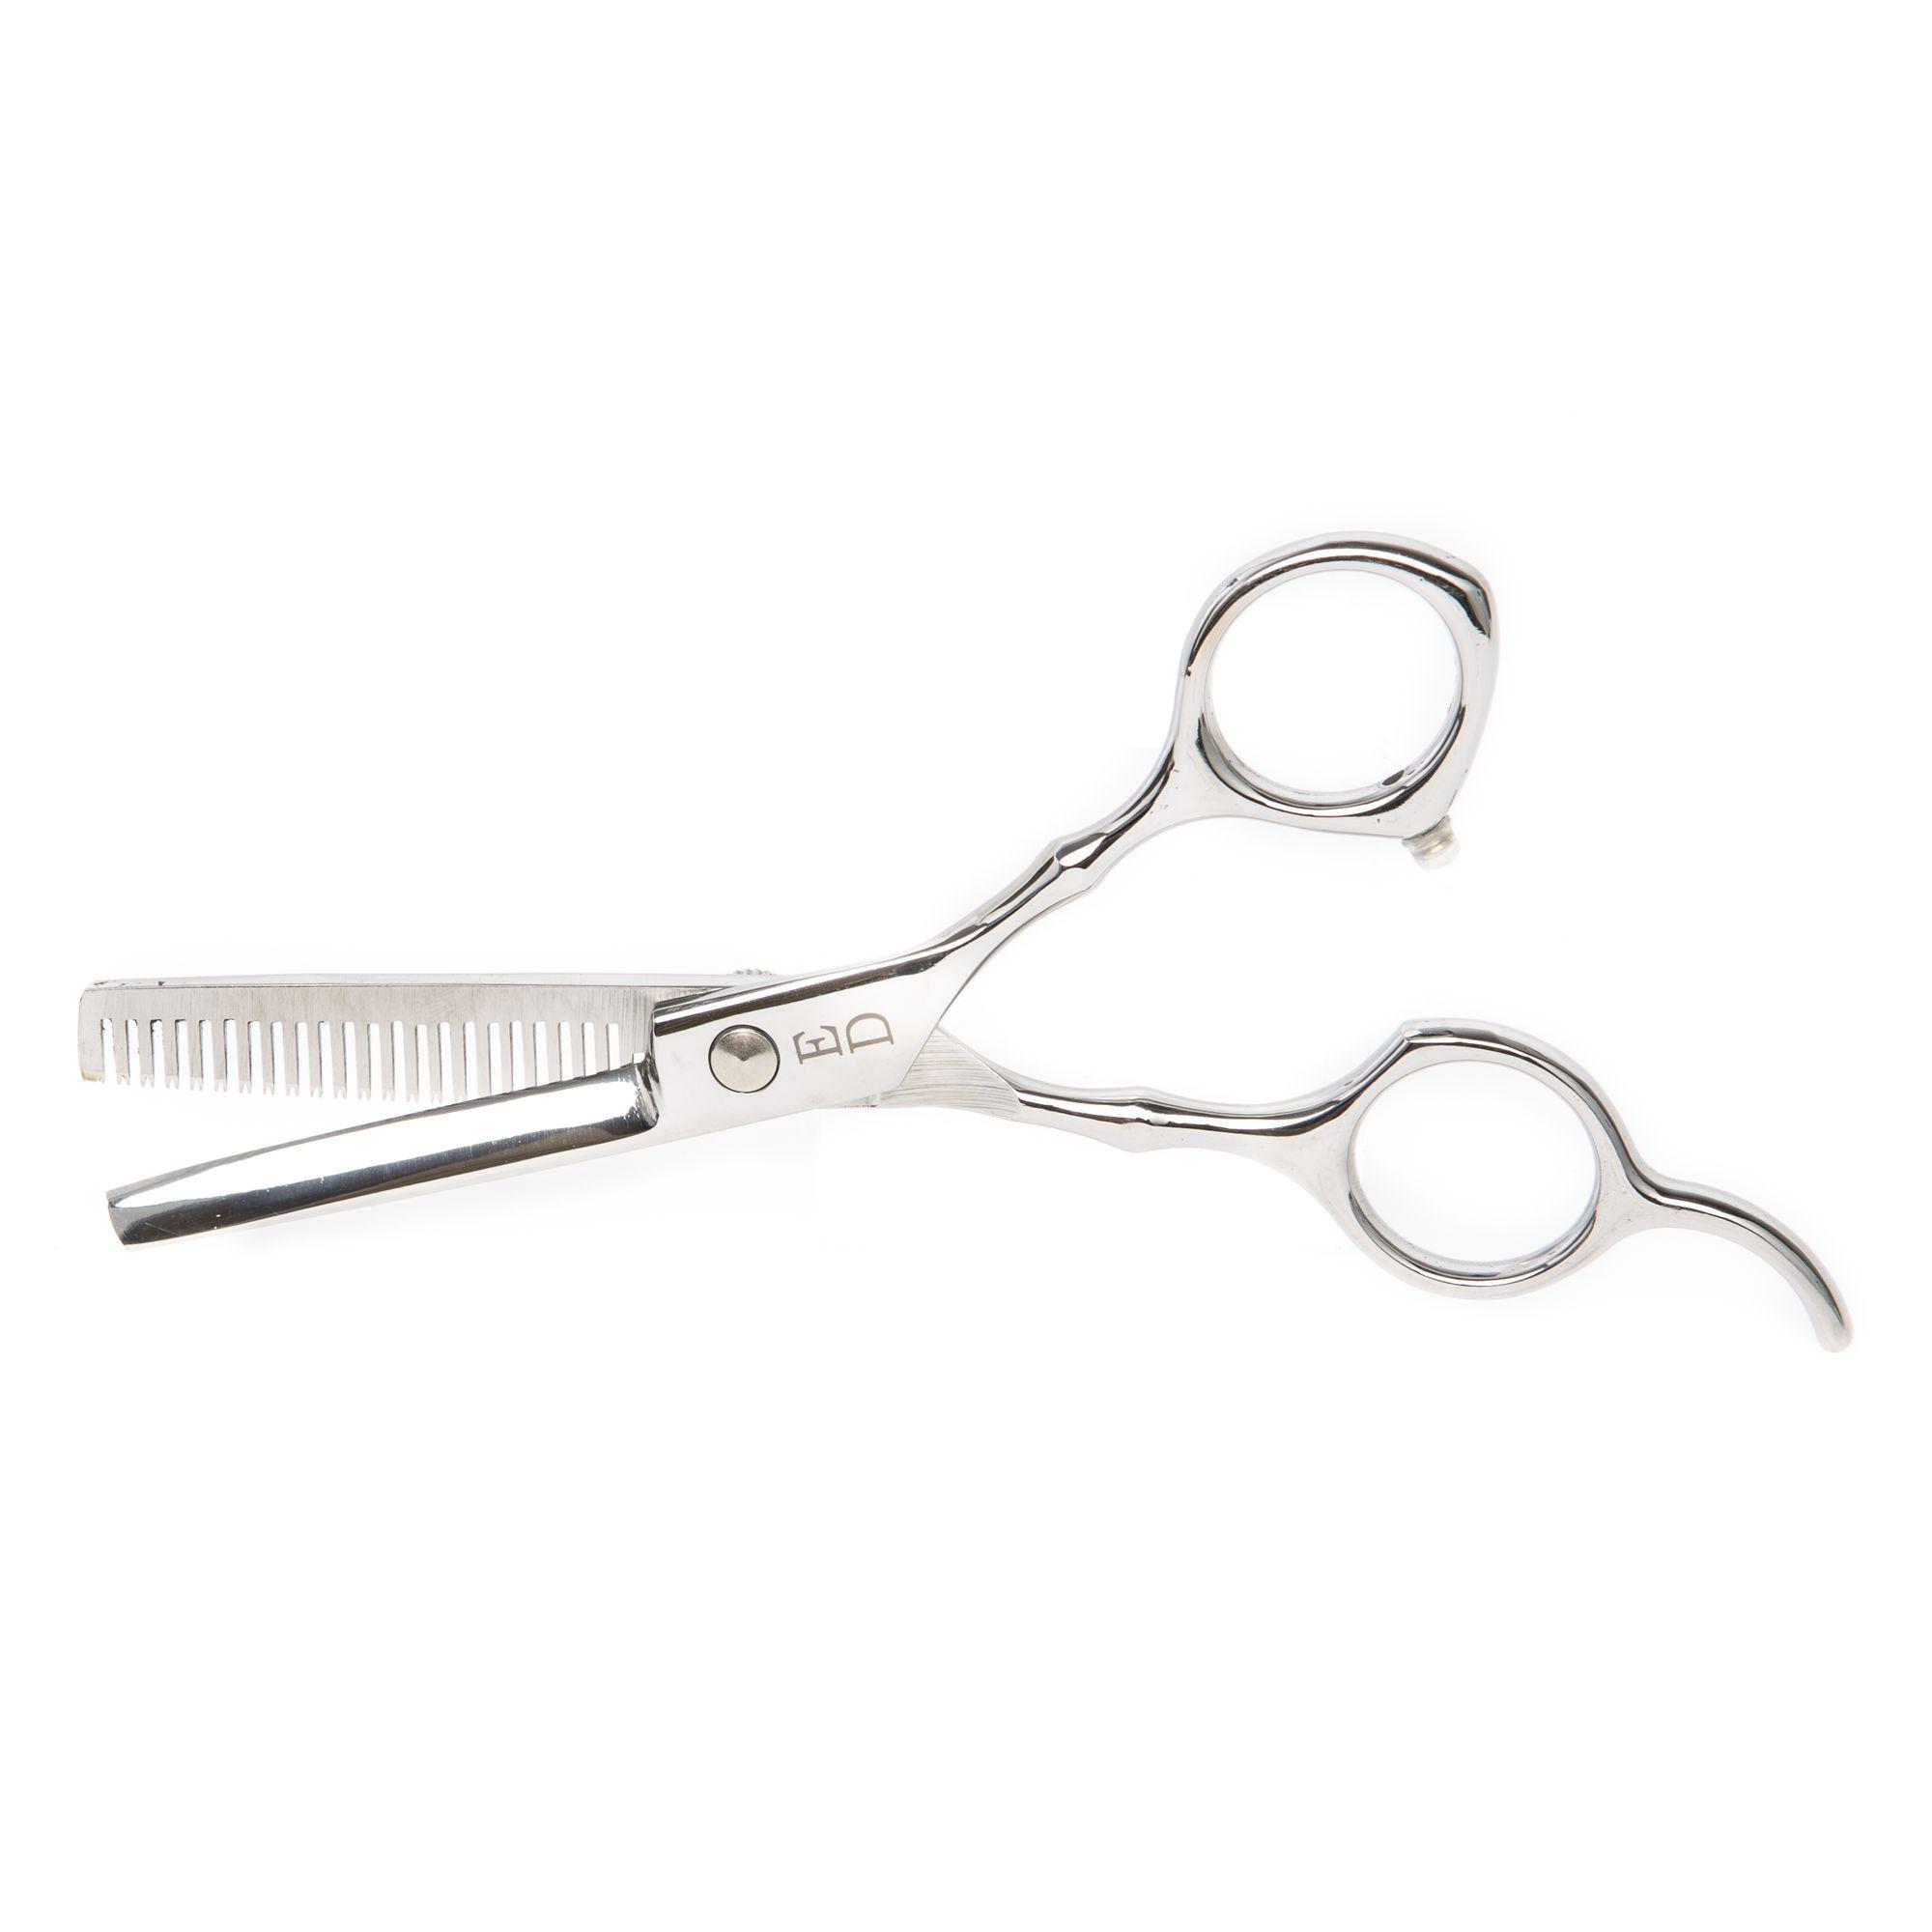 Ed Ellen Degeneres Small Dog Thinning Scissors With Images Thinning Scissors Petsmart Dog Hair